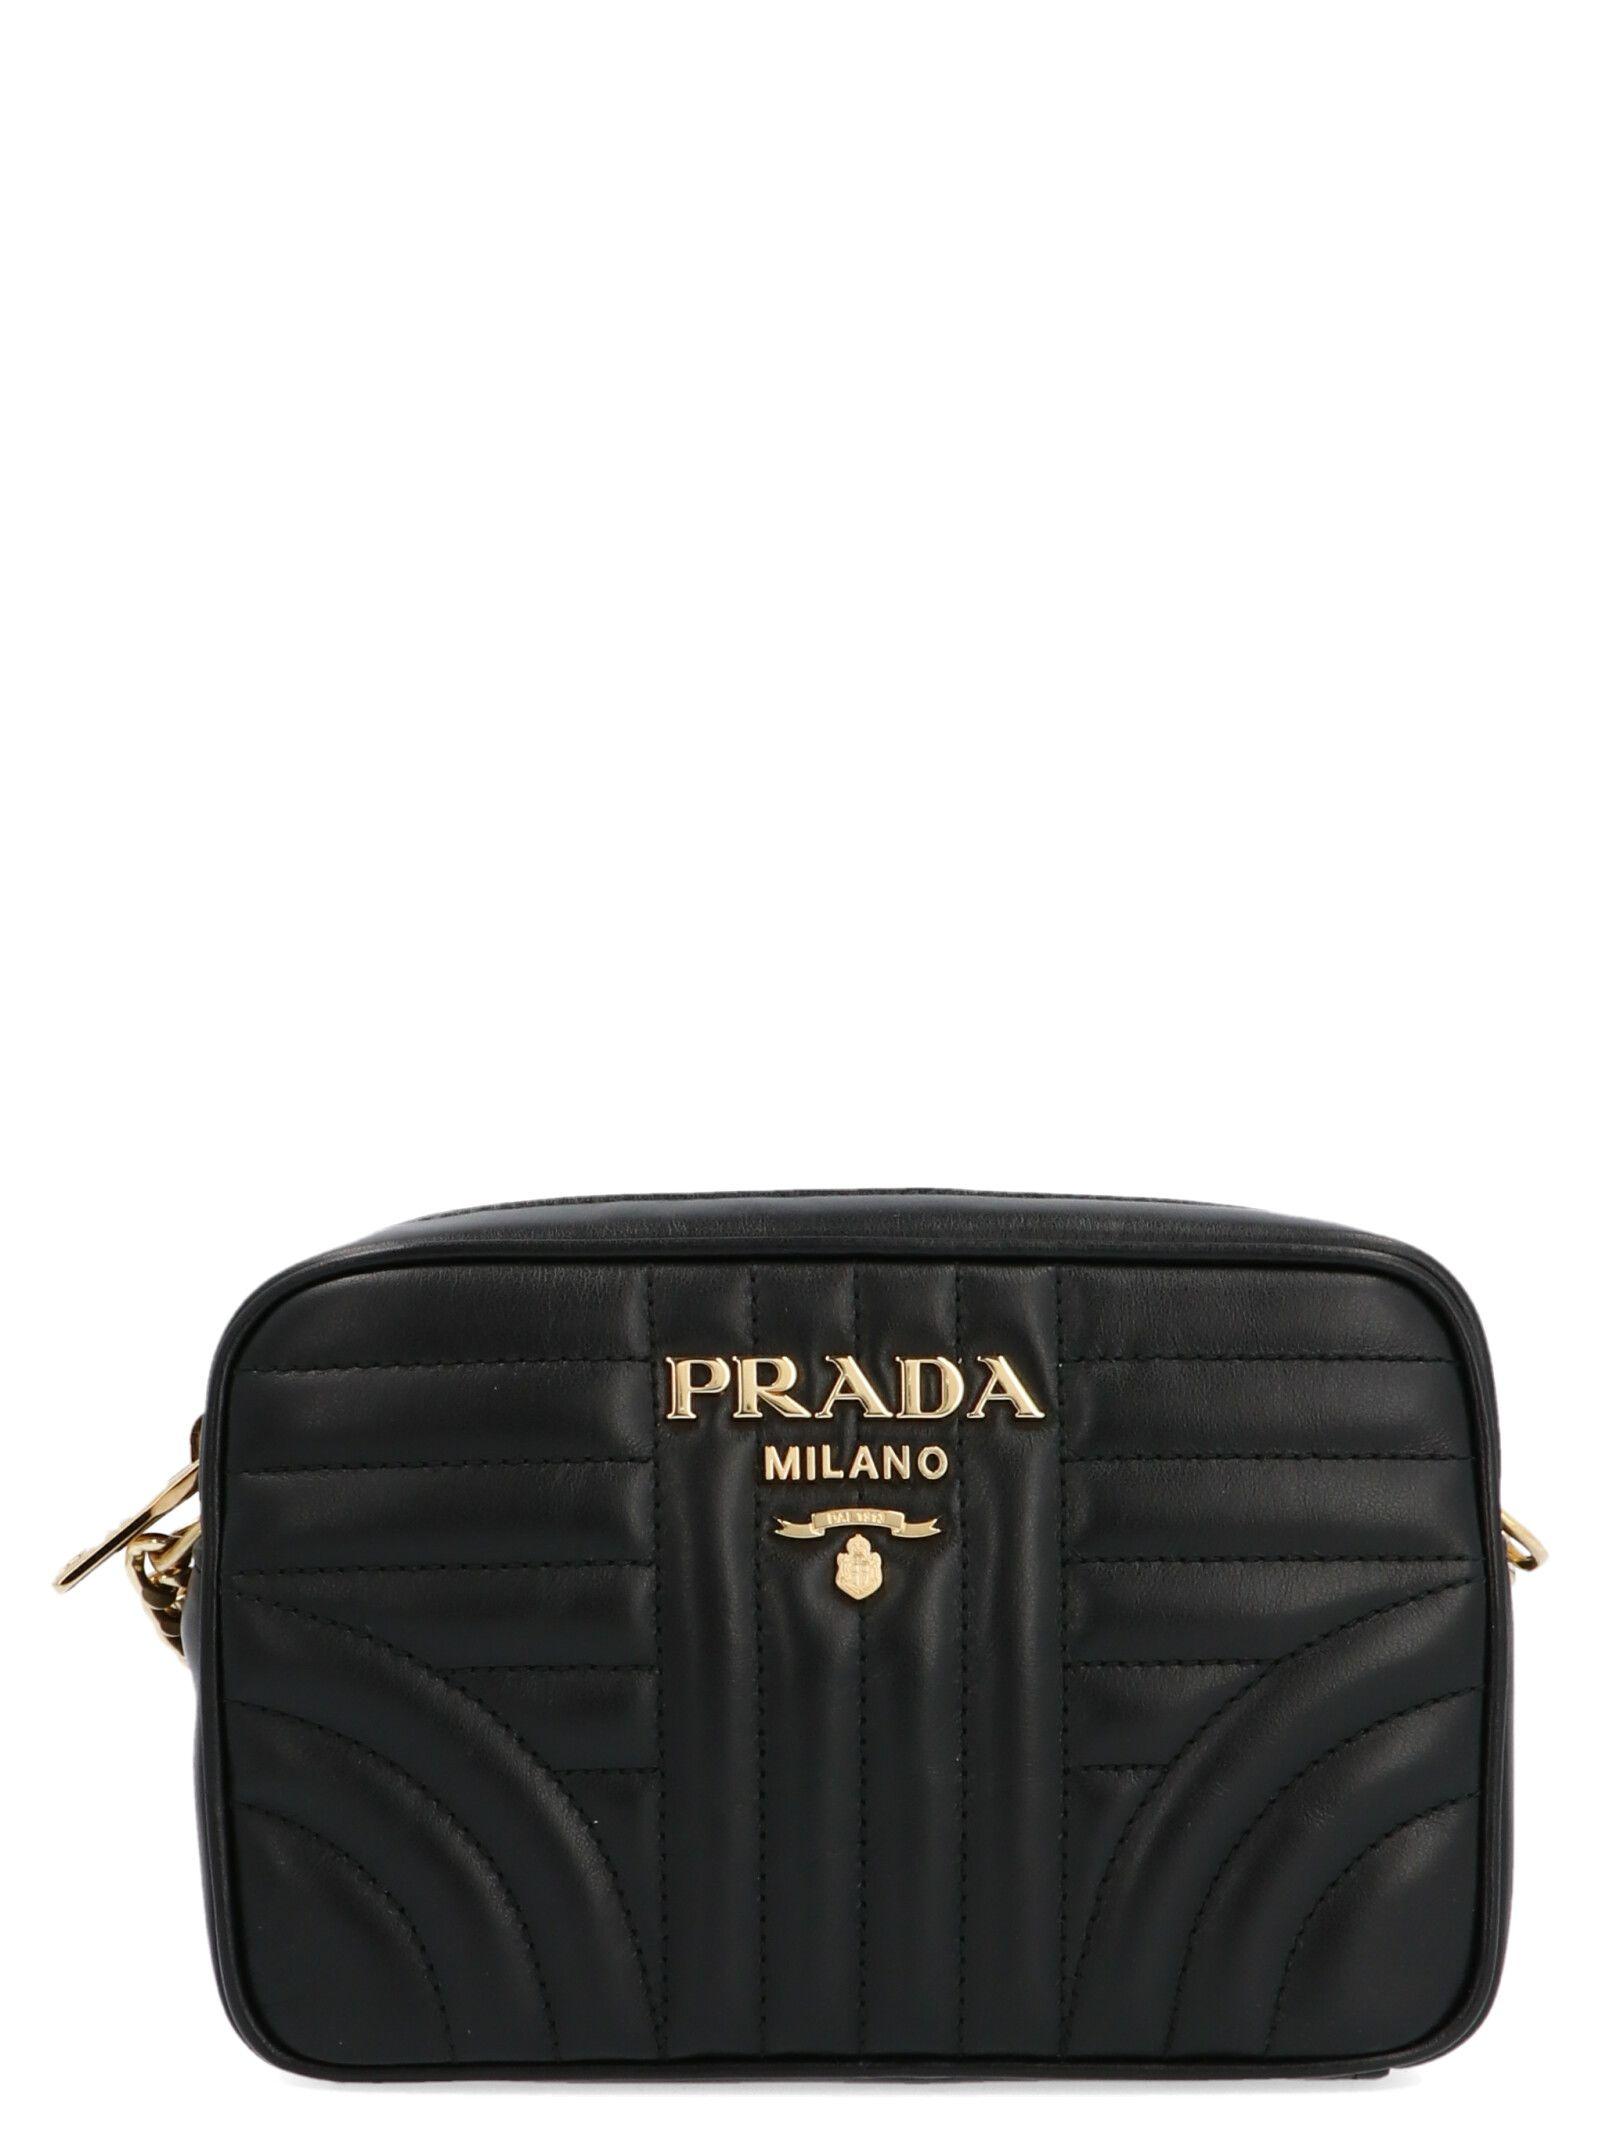 0a7c91c8c7db Prada Prada 'diagramme' Bag - Black - 10961752   italist